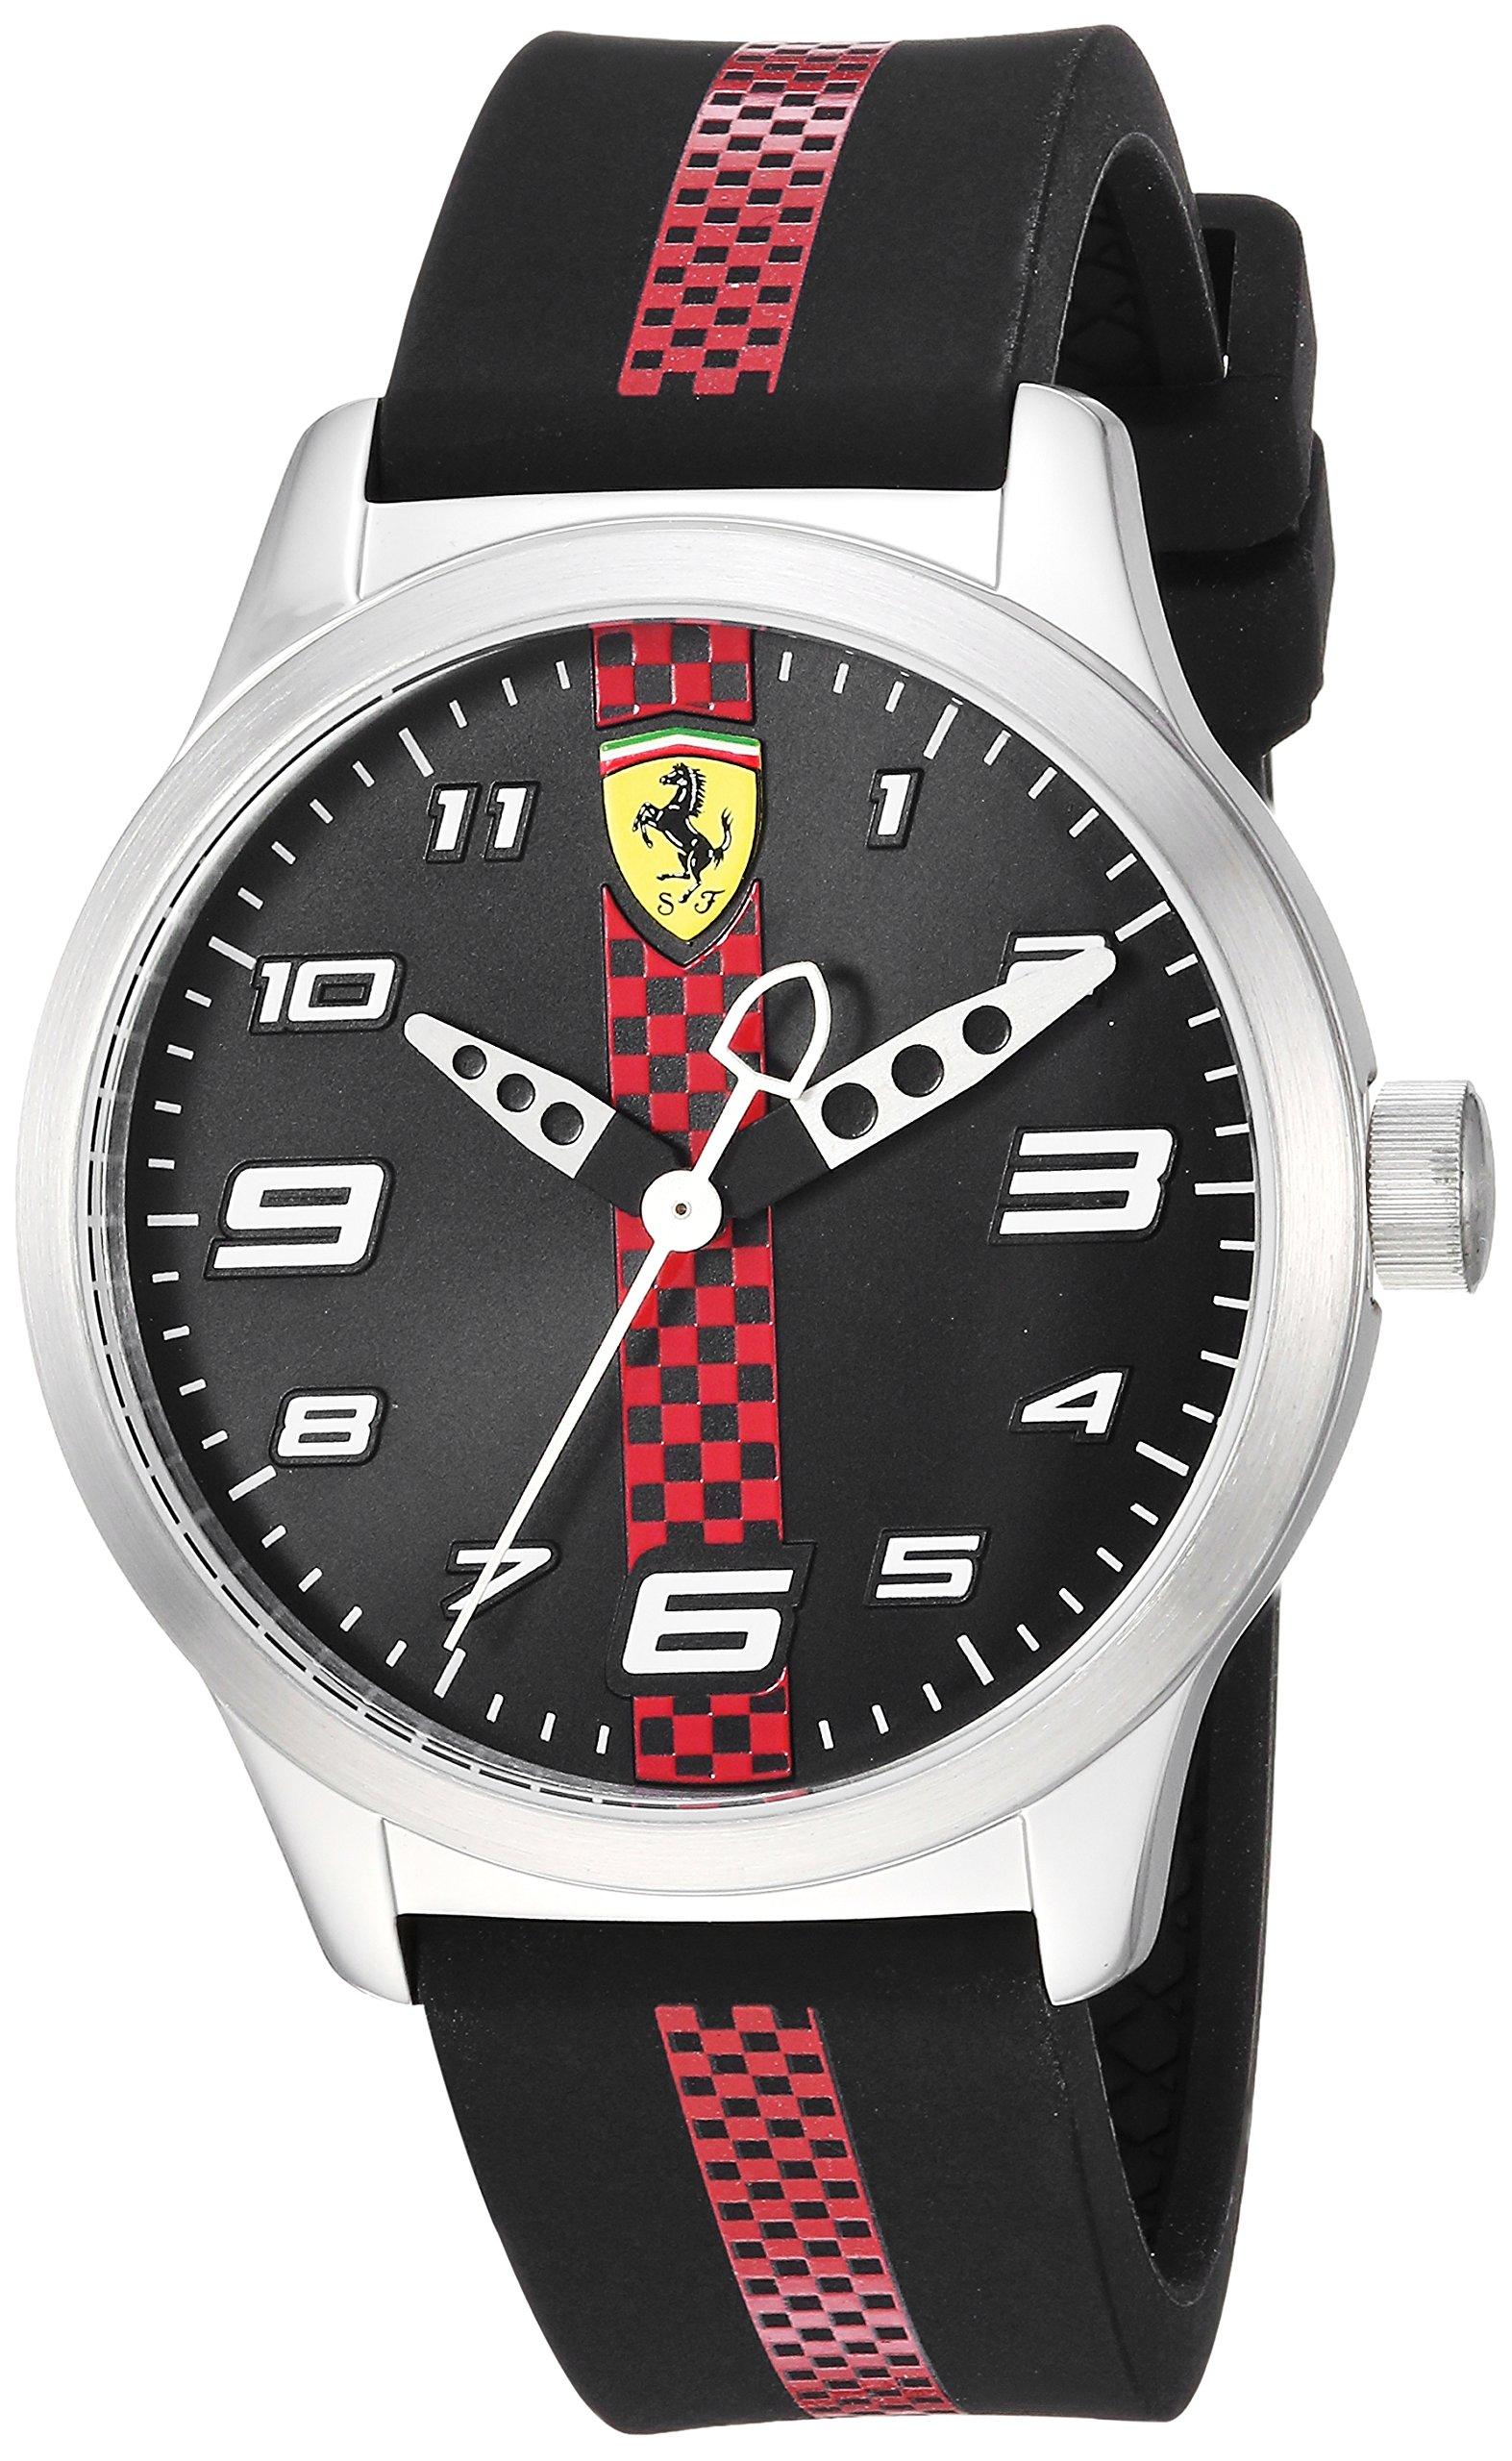 Ferrari Pitlane, Quartz Stainless Steel and Silicone Strap Casual Watch, Black, Boy, 860002 by Ferrari